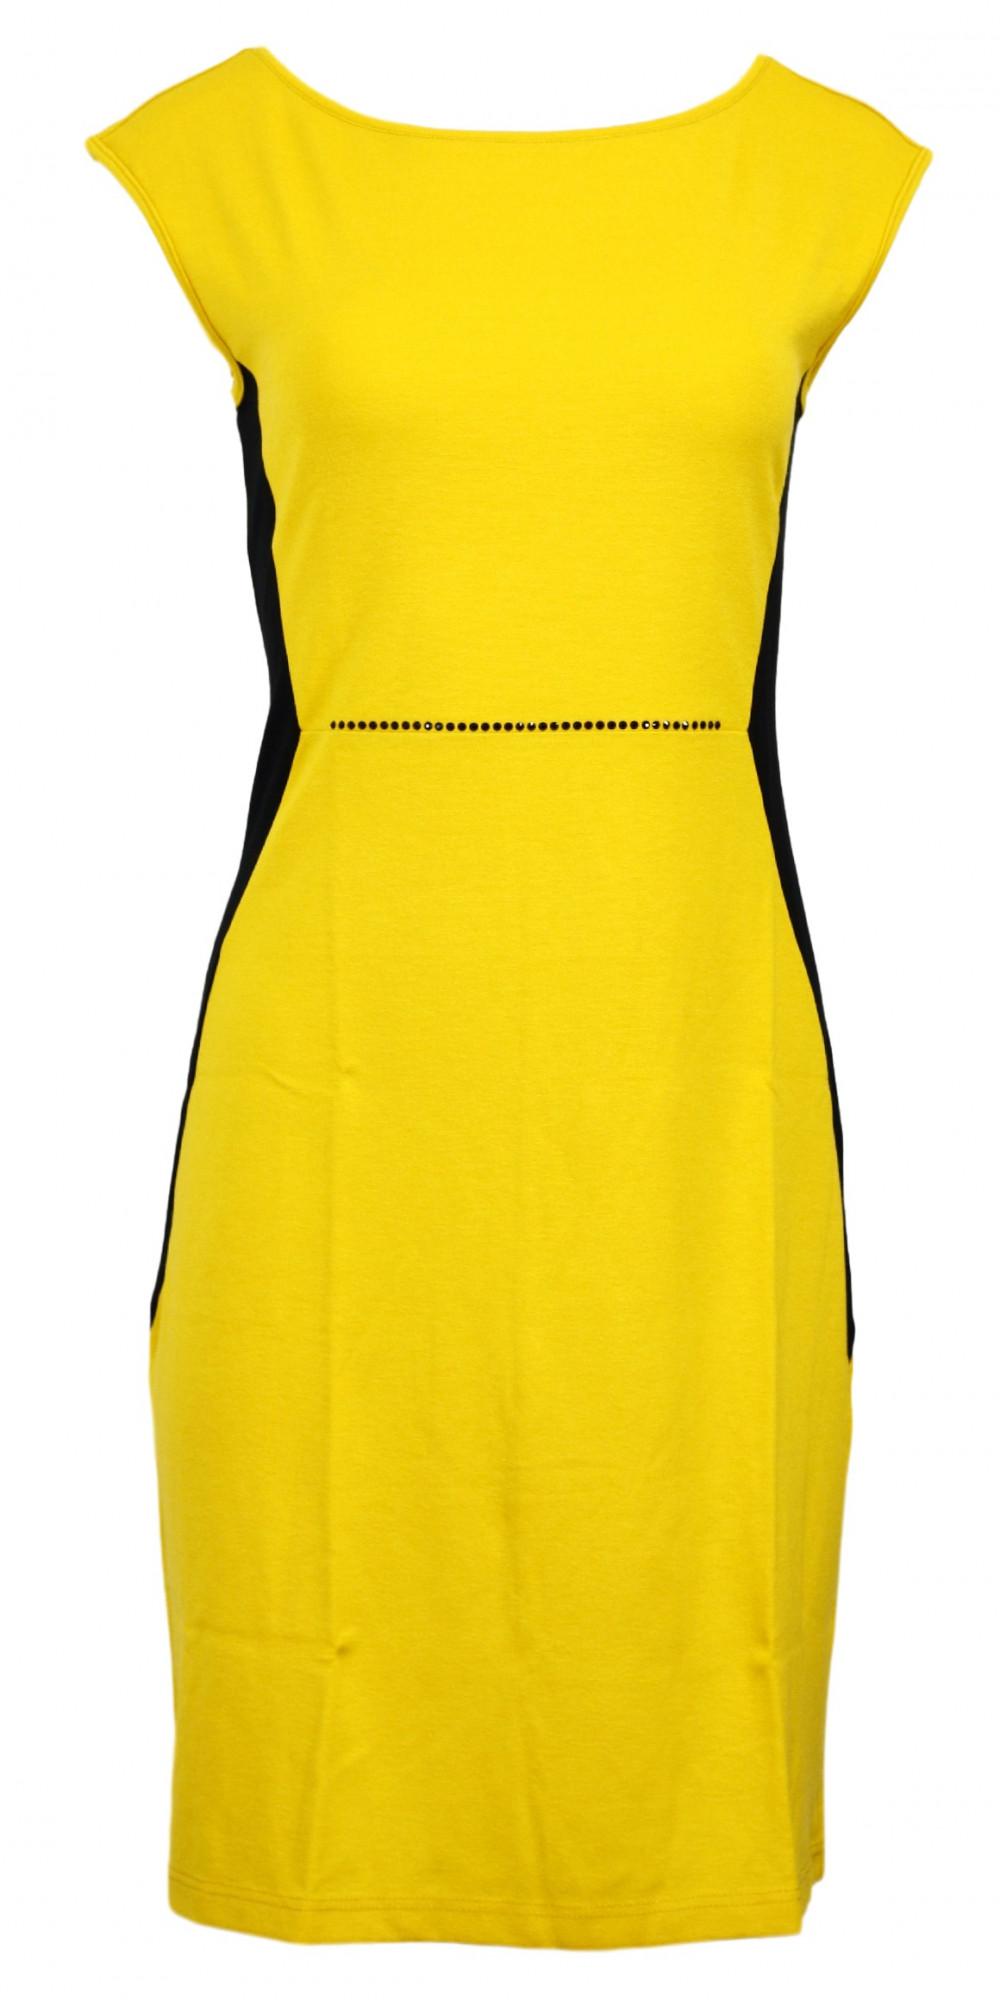 Šaty Saxa - Favab Barva: vanilka, Velikost: XL